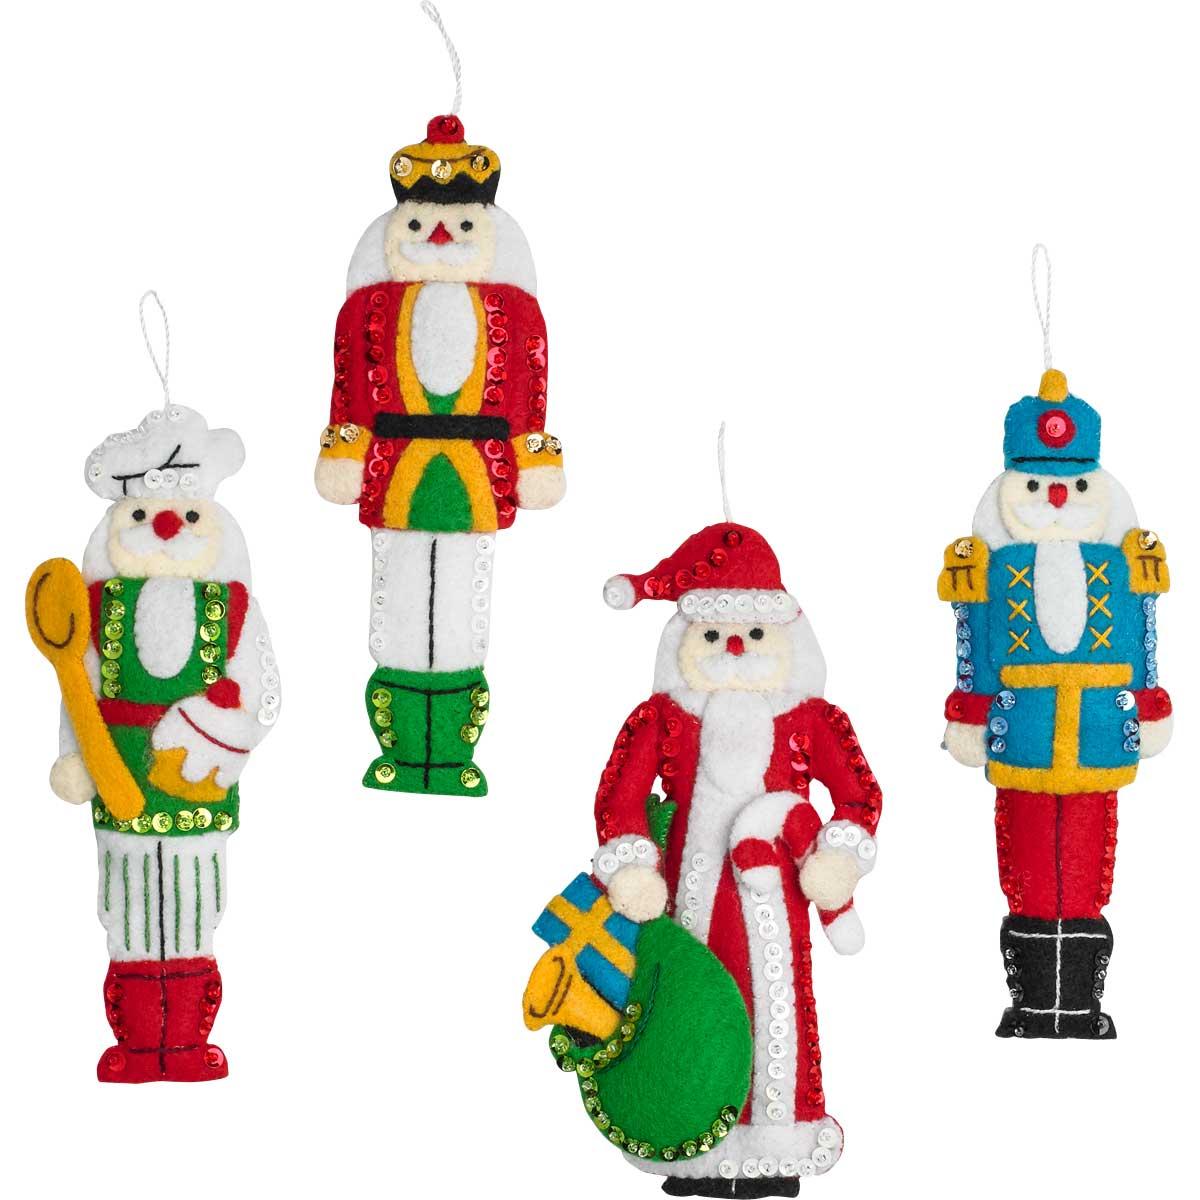 Bucilla ® Seasonal - Felt - Ornament Kits - Hallmark - Christmas Classic Nutcracker